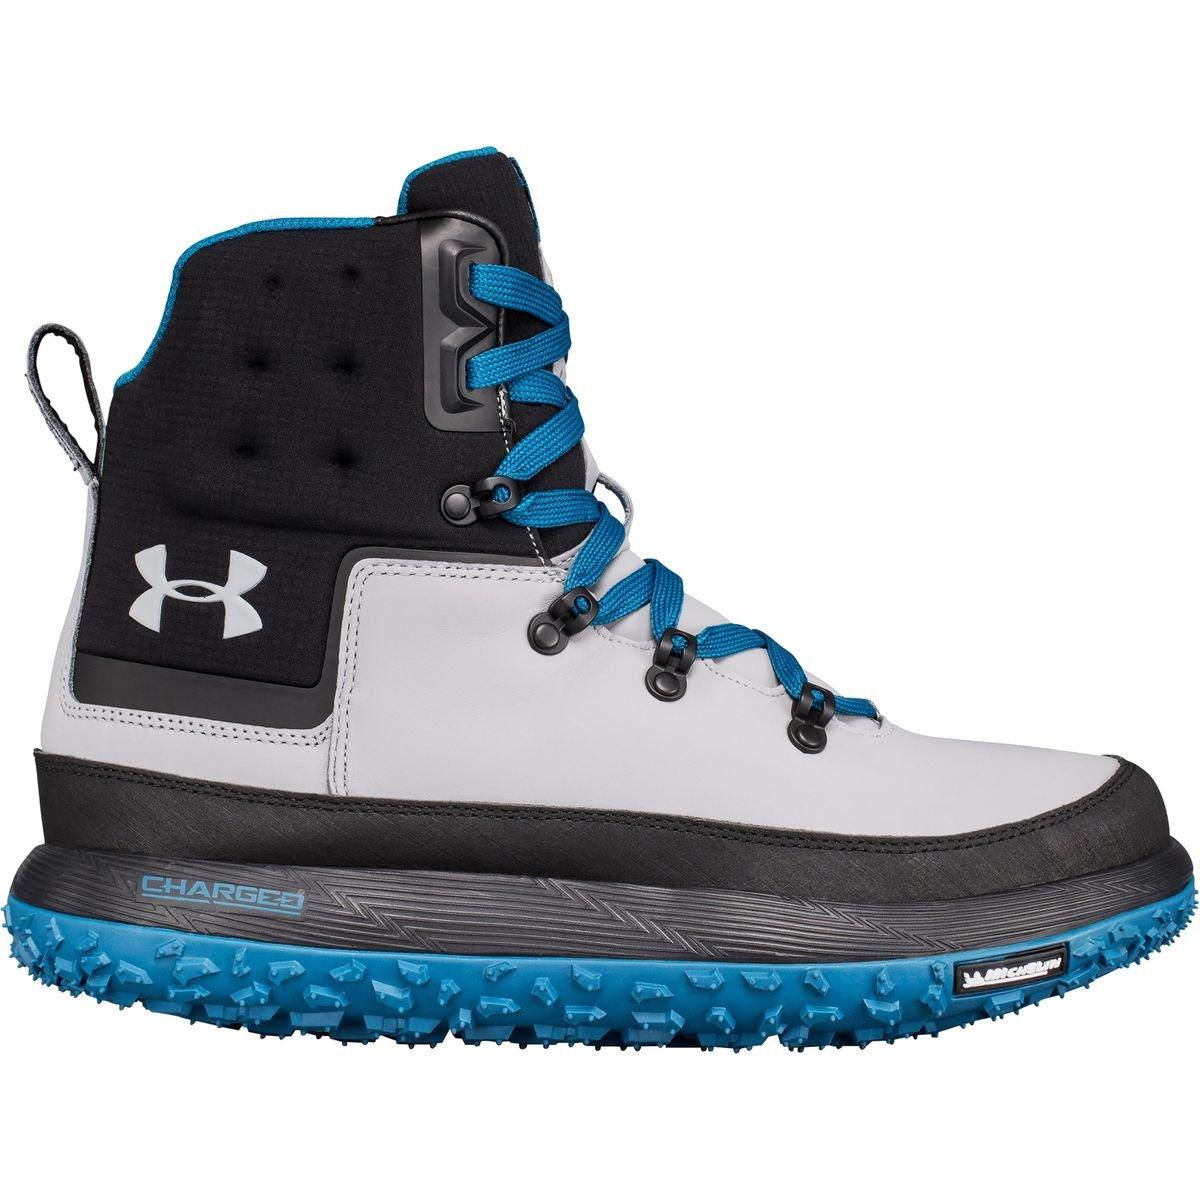 Under Armour Fat Tire Govie Winter Boot – Men's B01MZ1ZOYV 13 D(M) US Black/Overcast Gray/Overcast Gray